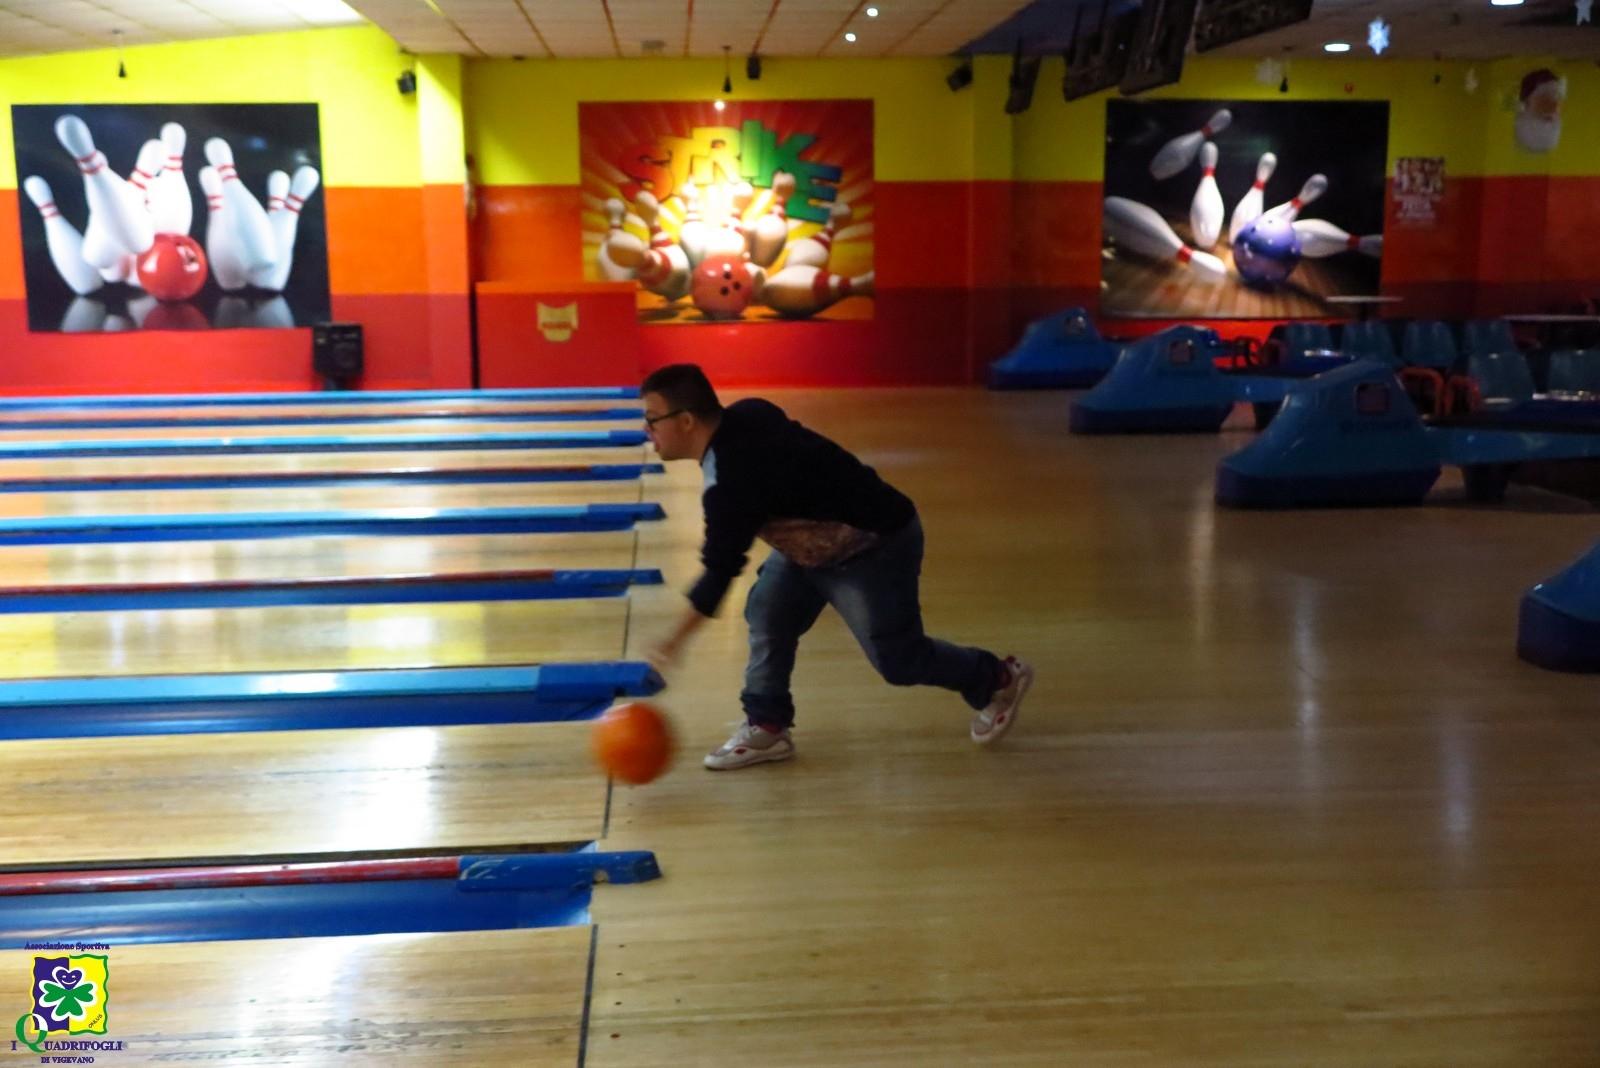 Torneo Bowling Vigevano 19-12-2018 - 012